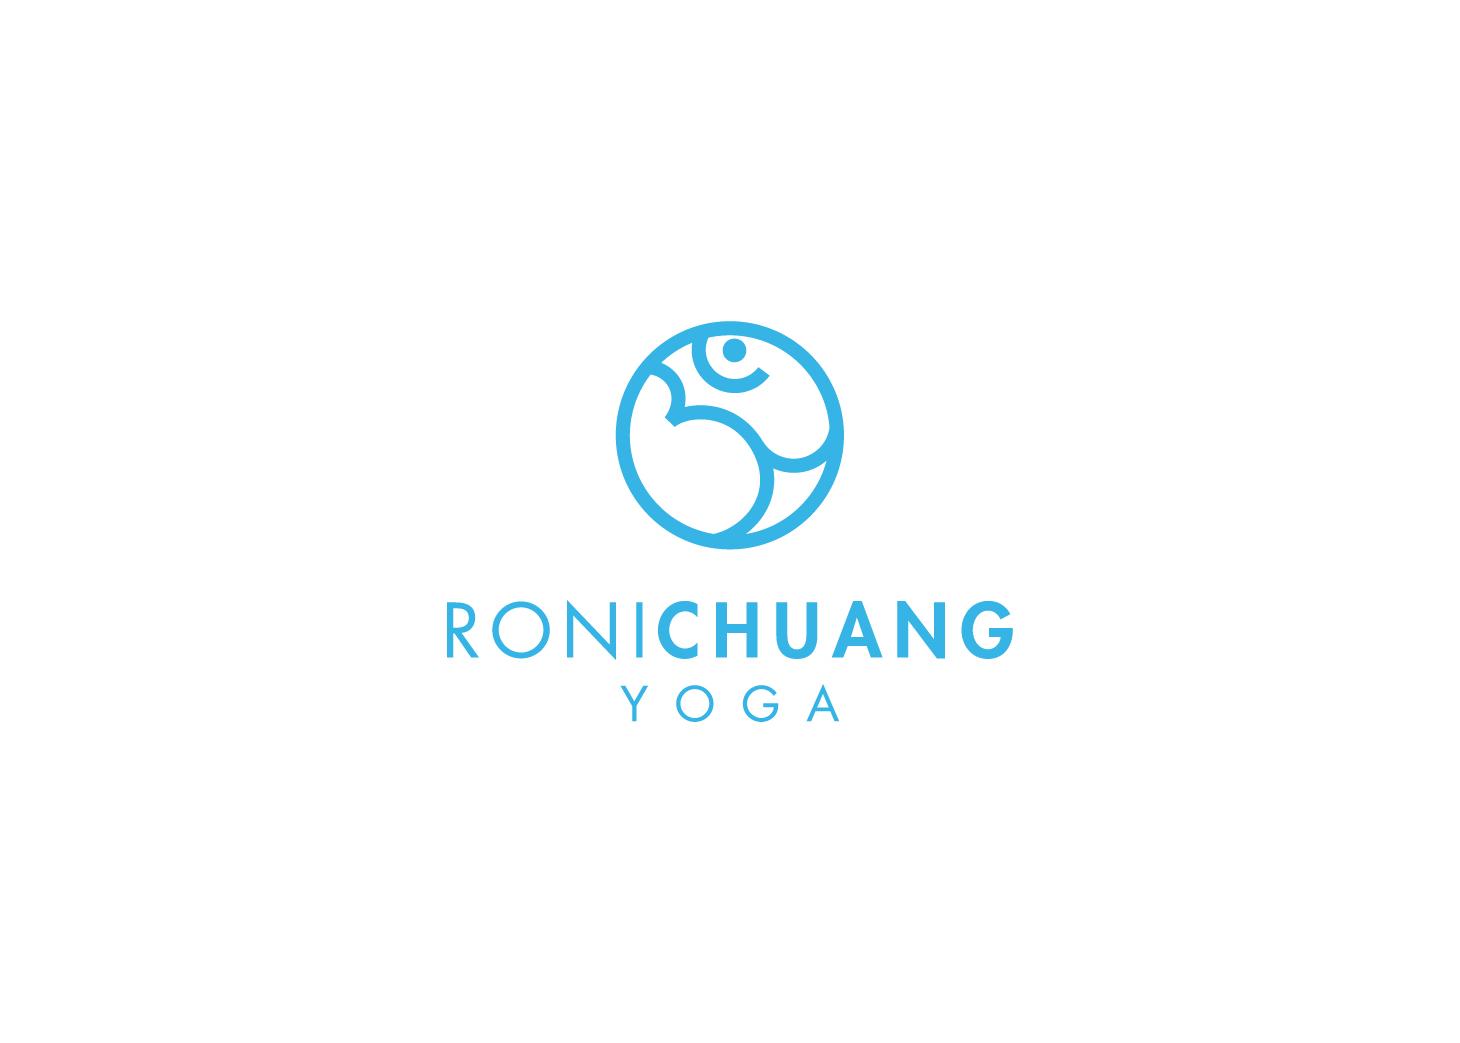 diseño-logotipo-yoga